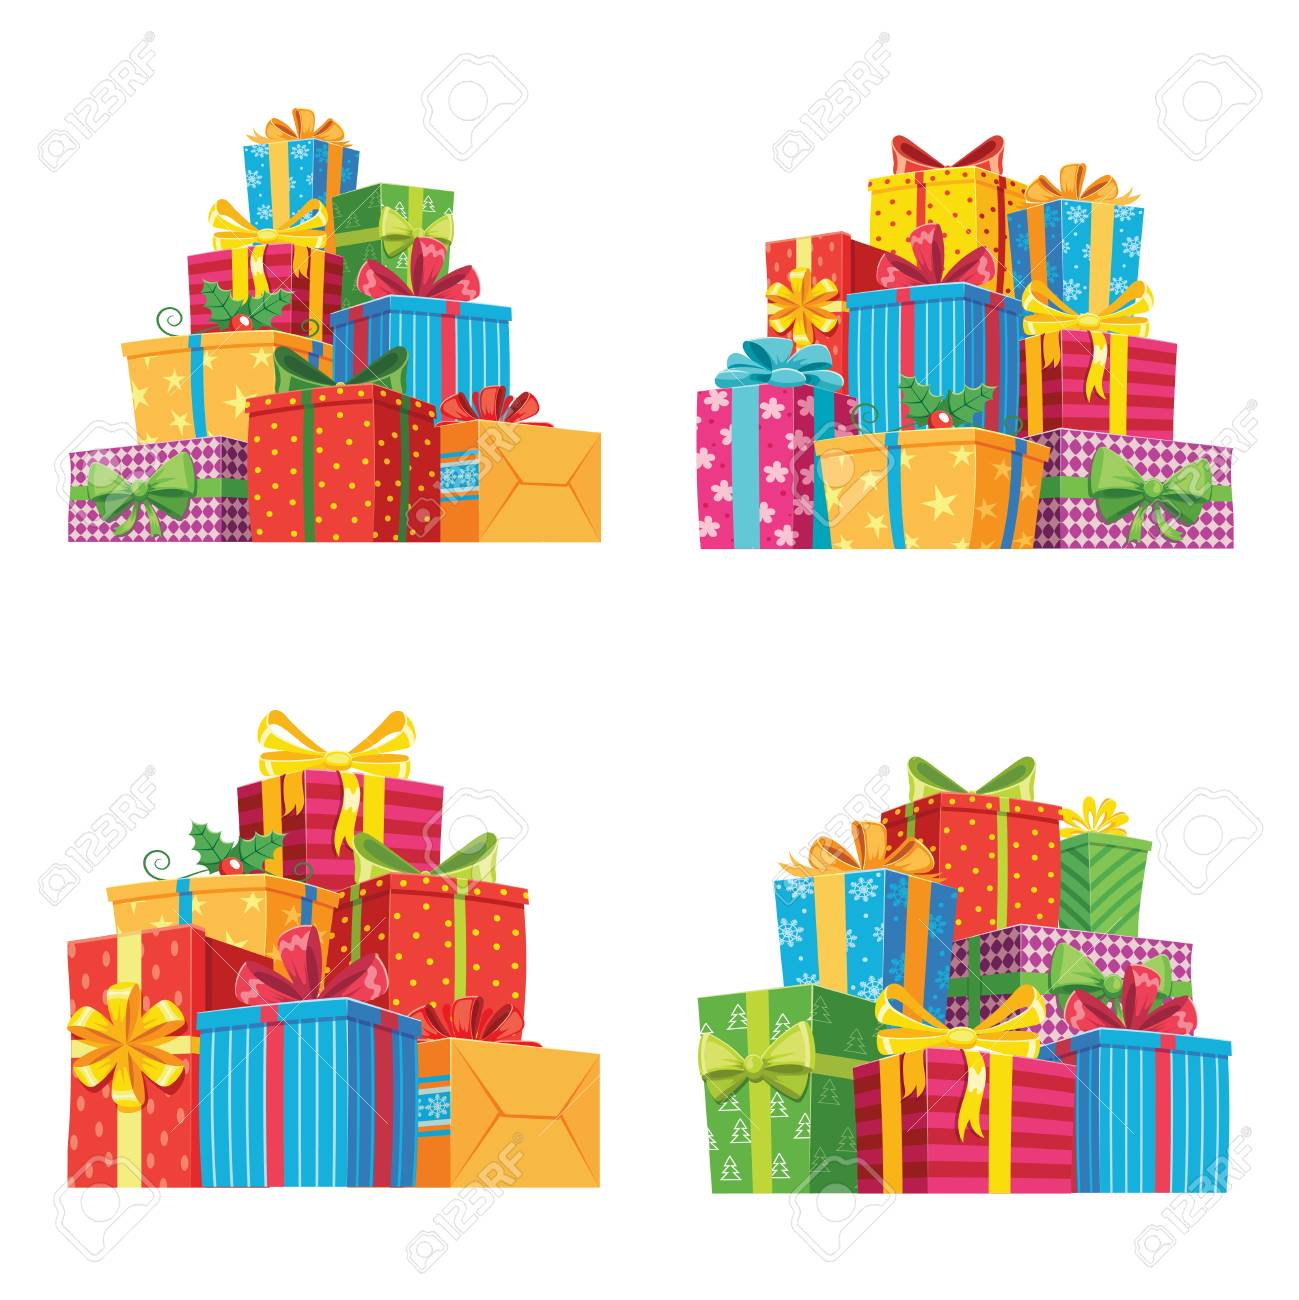 Christmas Presents In Gift Boxes Birthday Present Box Xmas